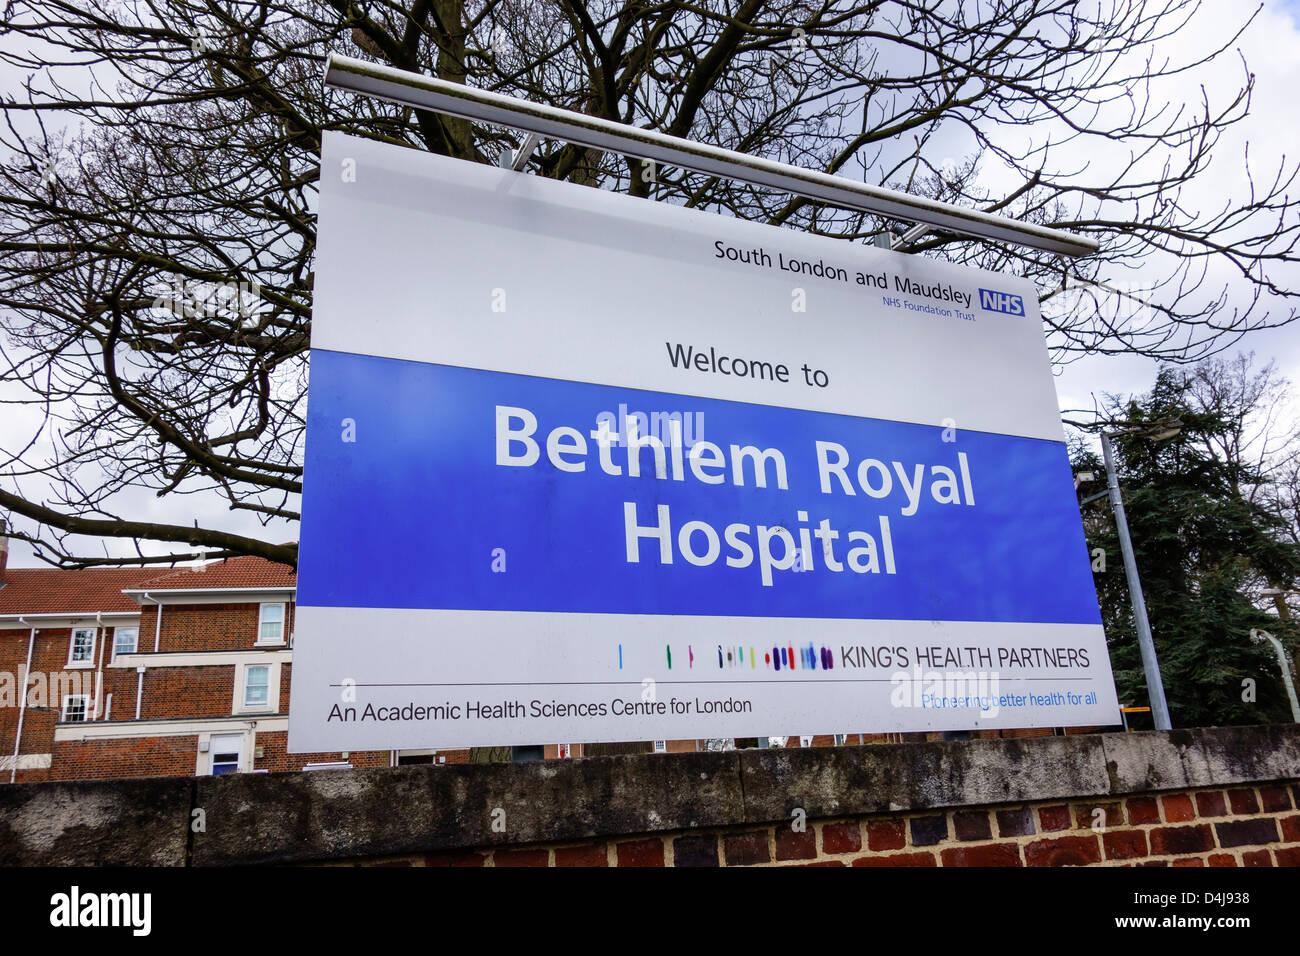 Bethlem Royal NHS Hospital Beckenham London. South London and Maudsley Trust - Stock Image